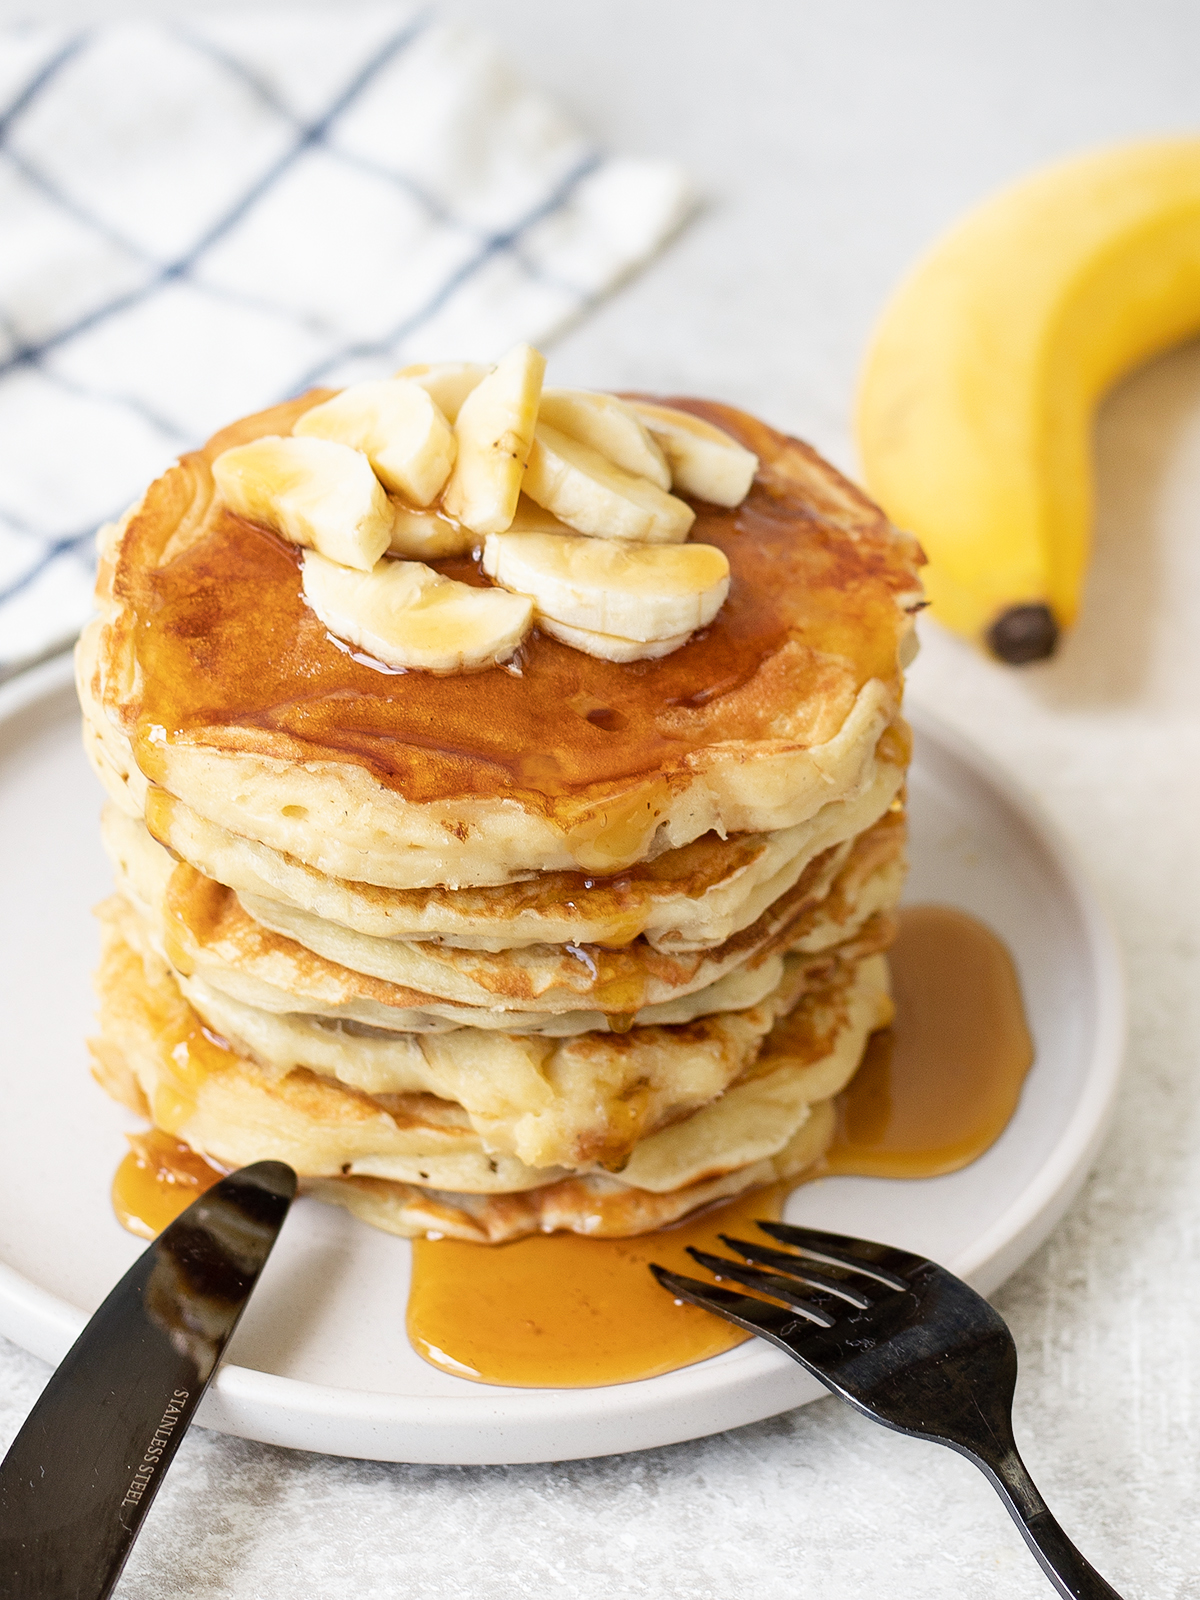 Banana Pancakes and a fork